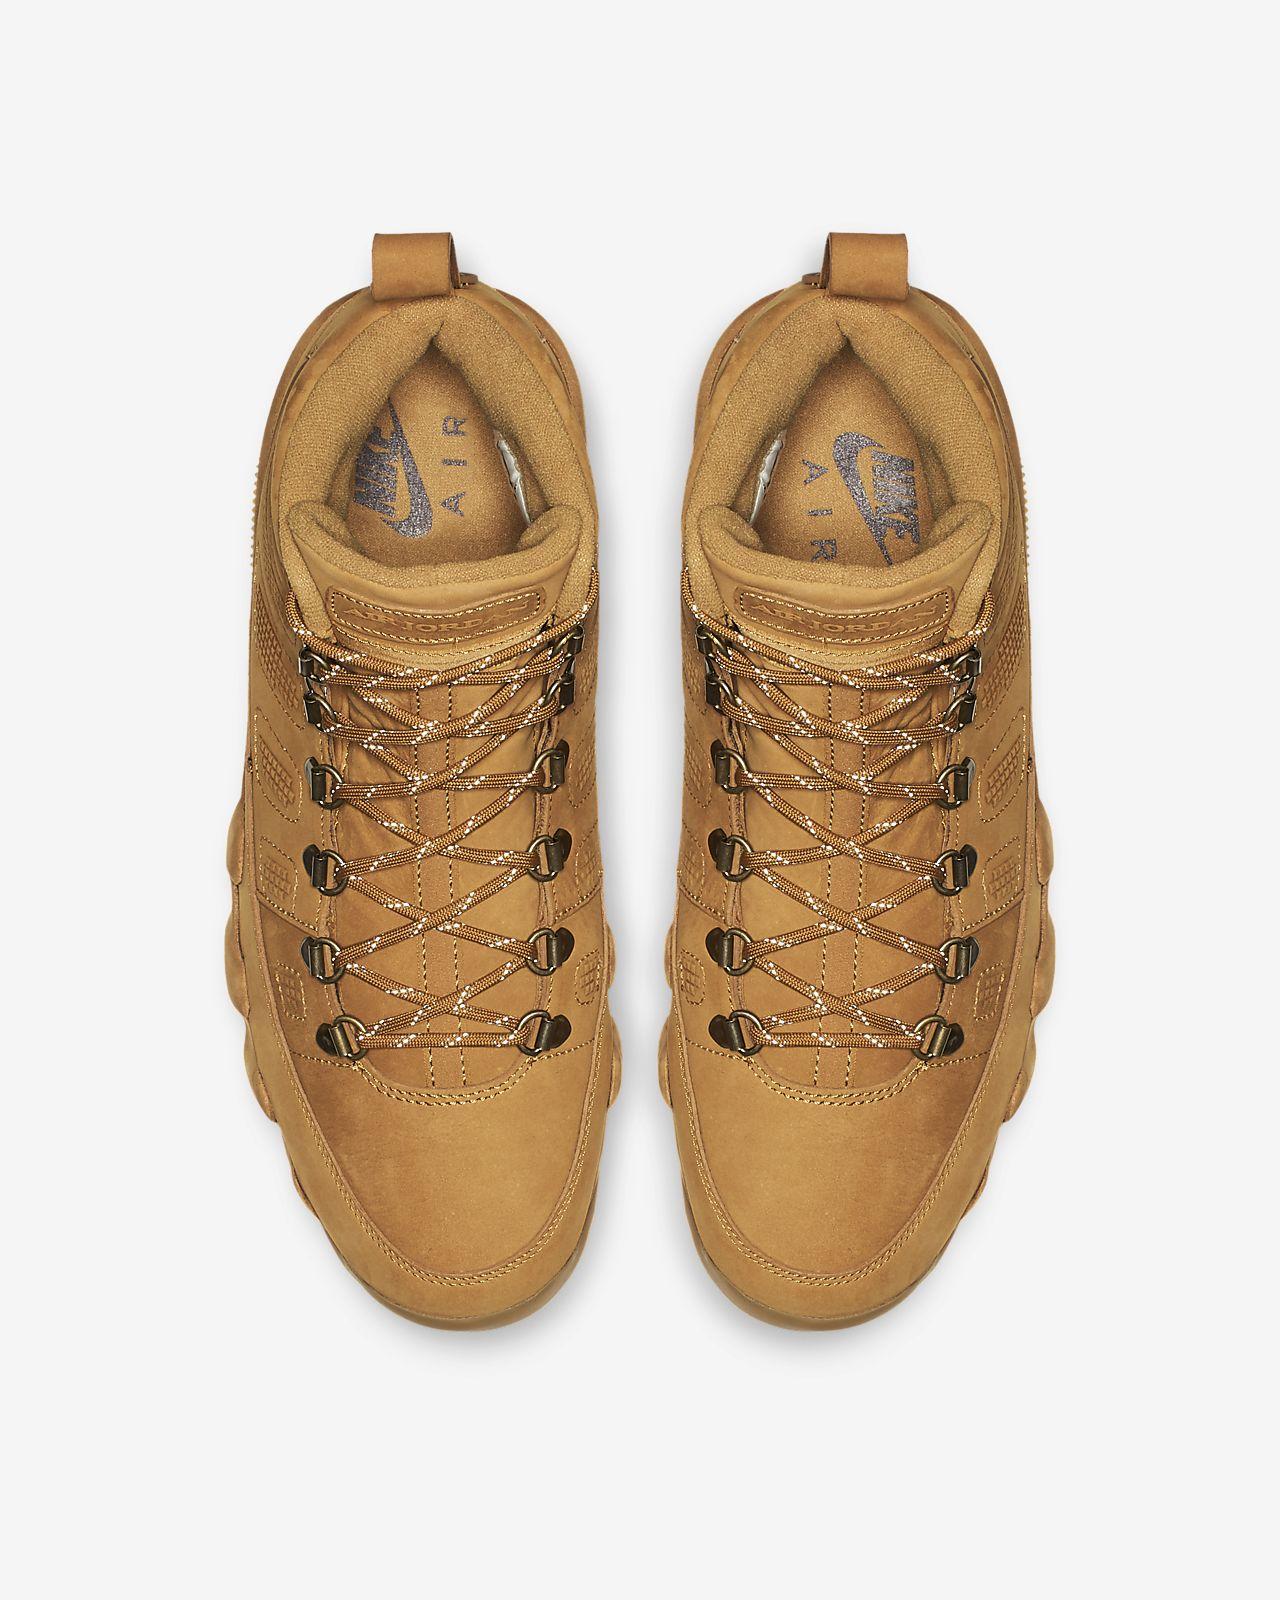 3464960506ae9 Air Jordan 9 Retro NRG Men s Boot. Nike.com